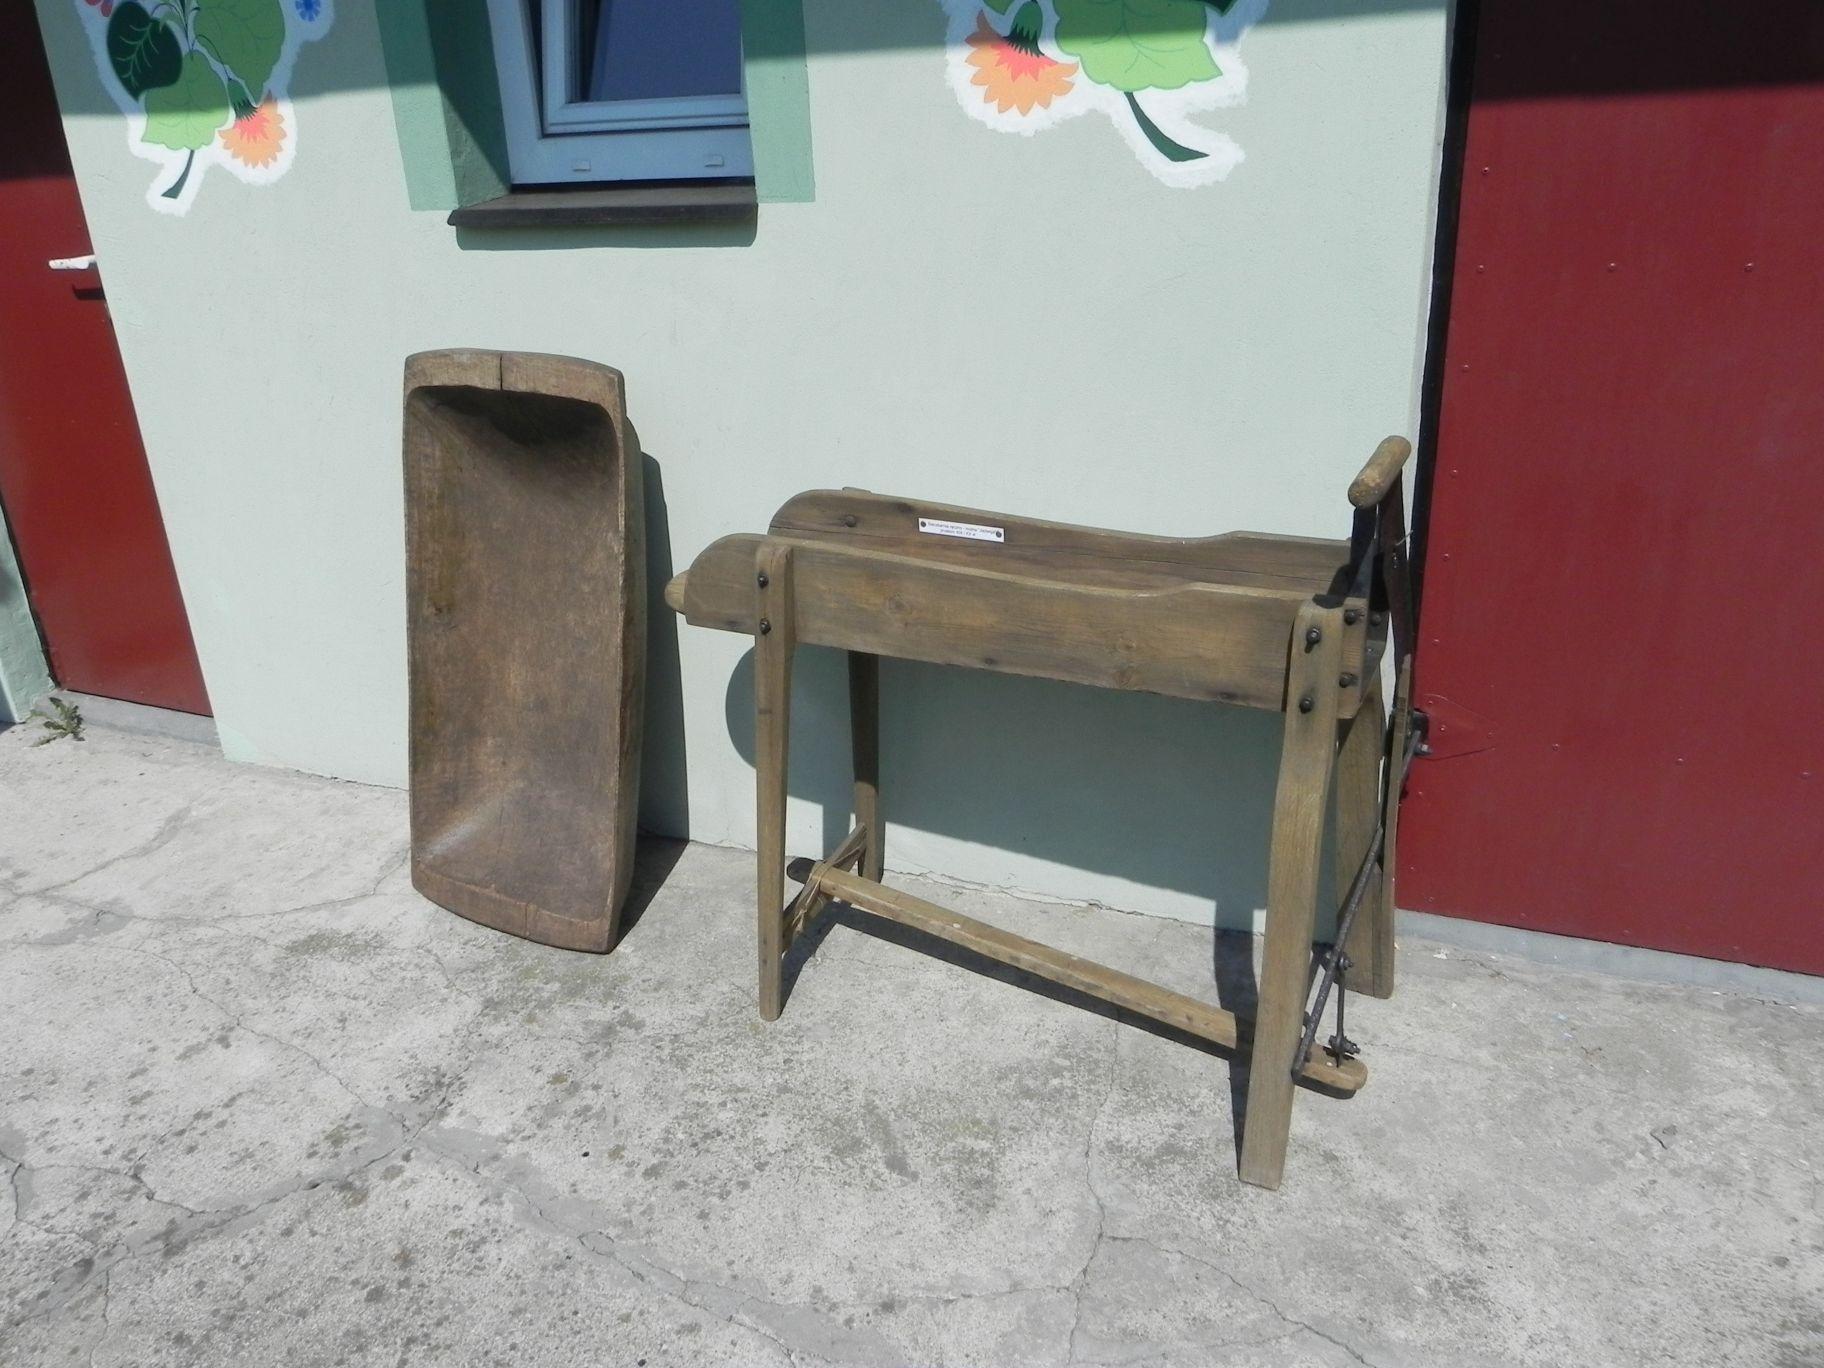 2012-05-03 Lipce Reymontowskie - galeria staroci (24)